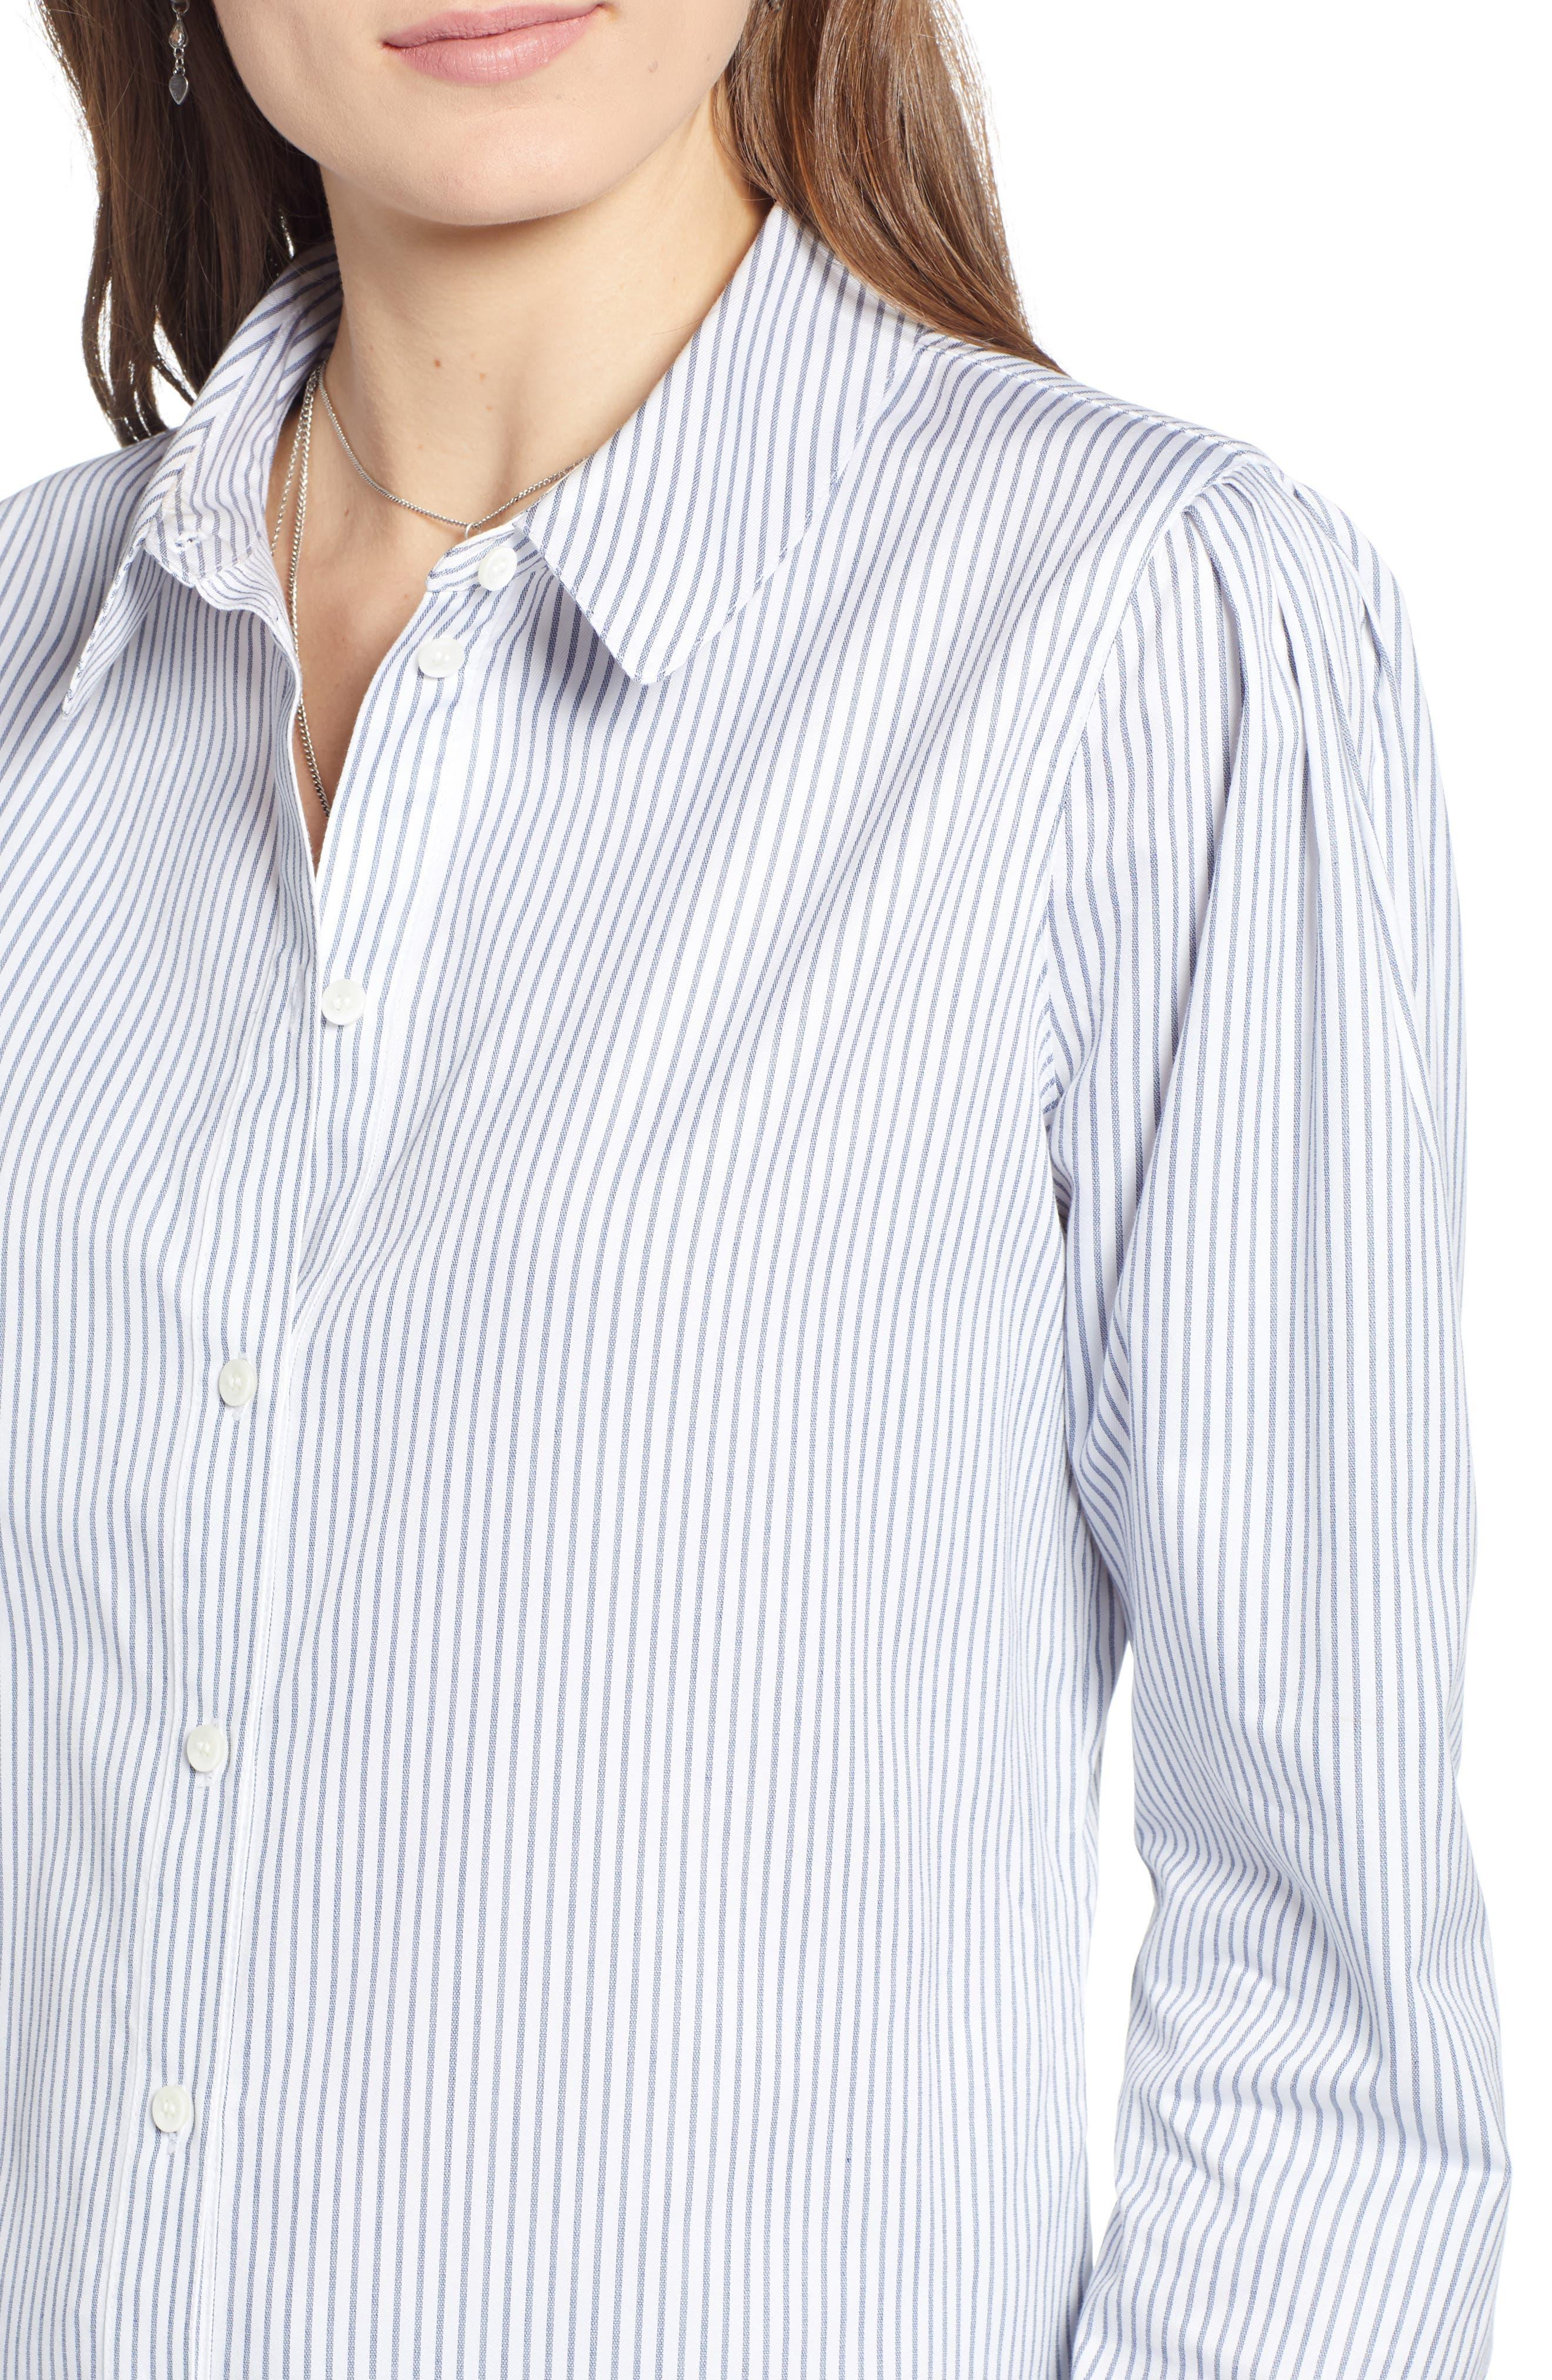 Pleated Sleeve Stripe Shirt,                             Alternate thumbnail 4, color,                             WHITE STOCKHOLM STRIPE